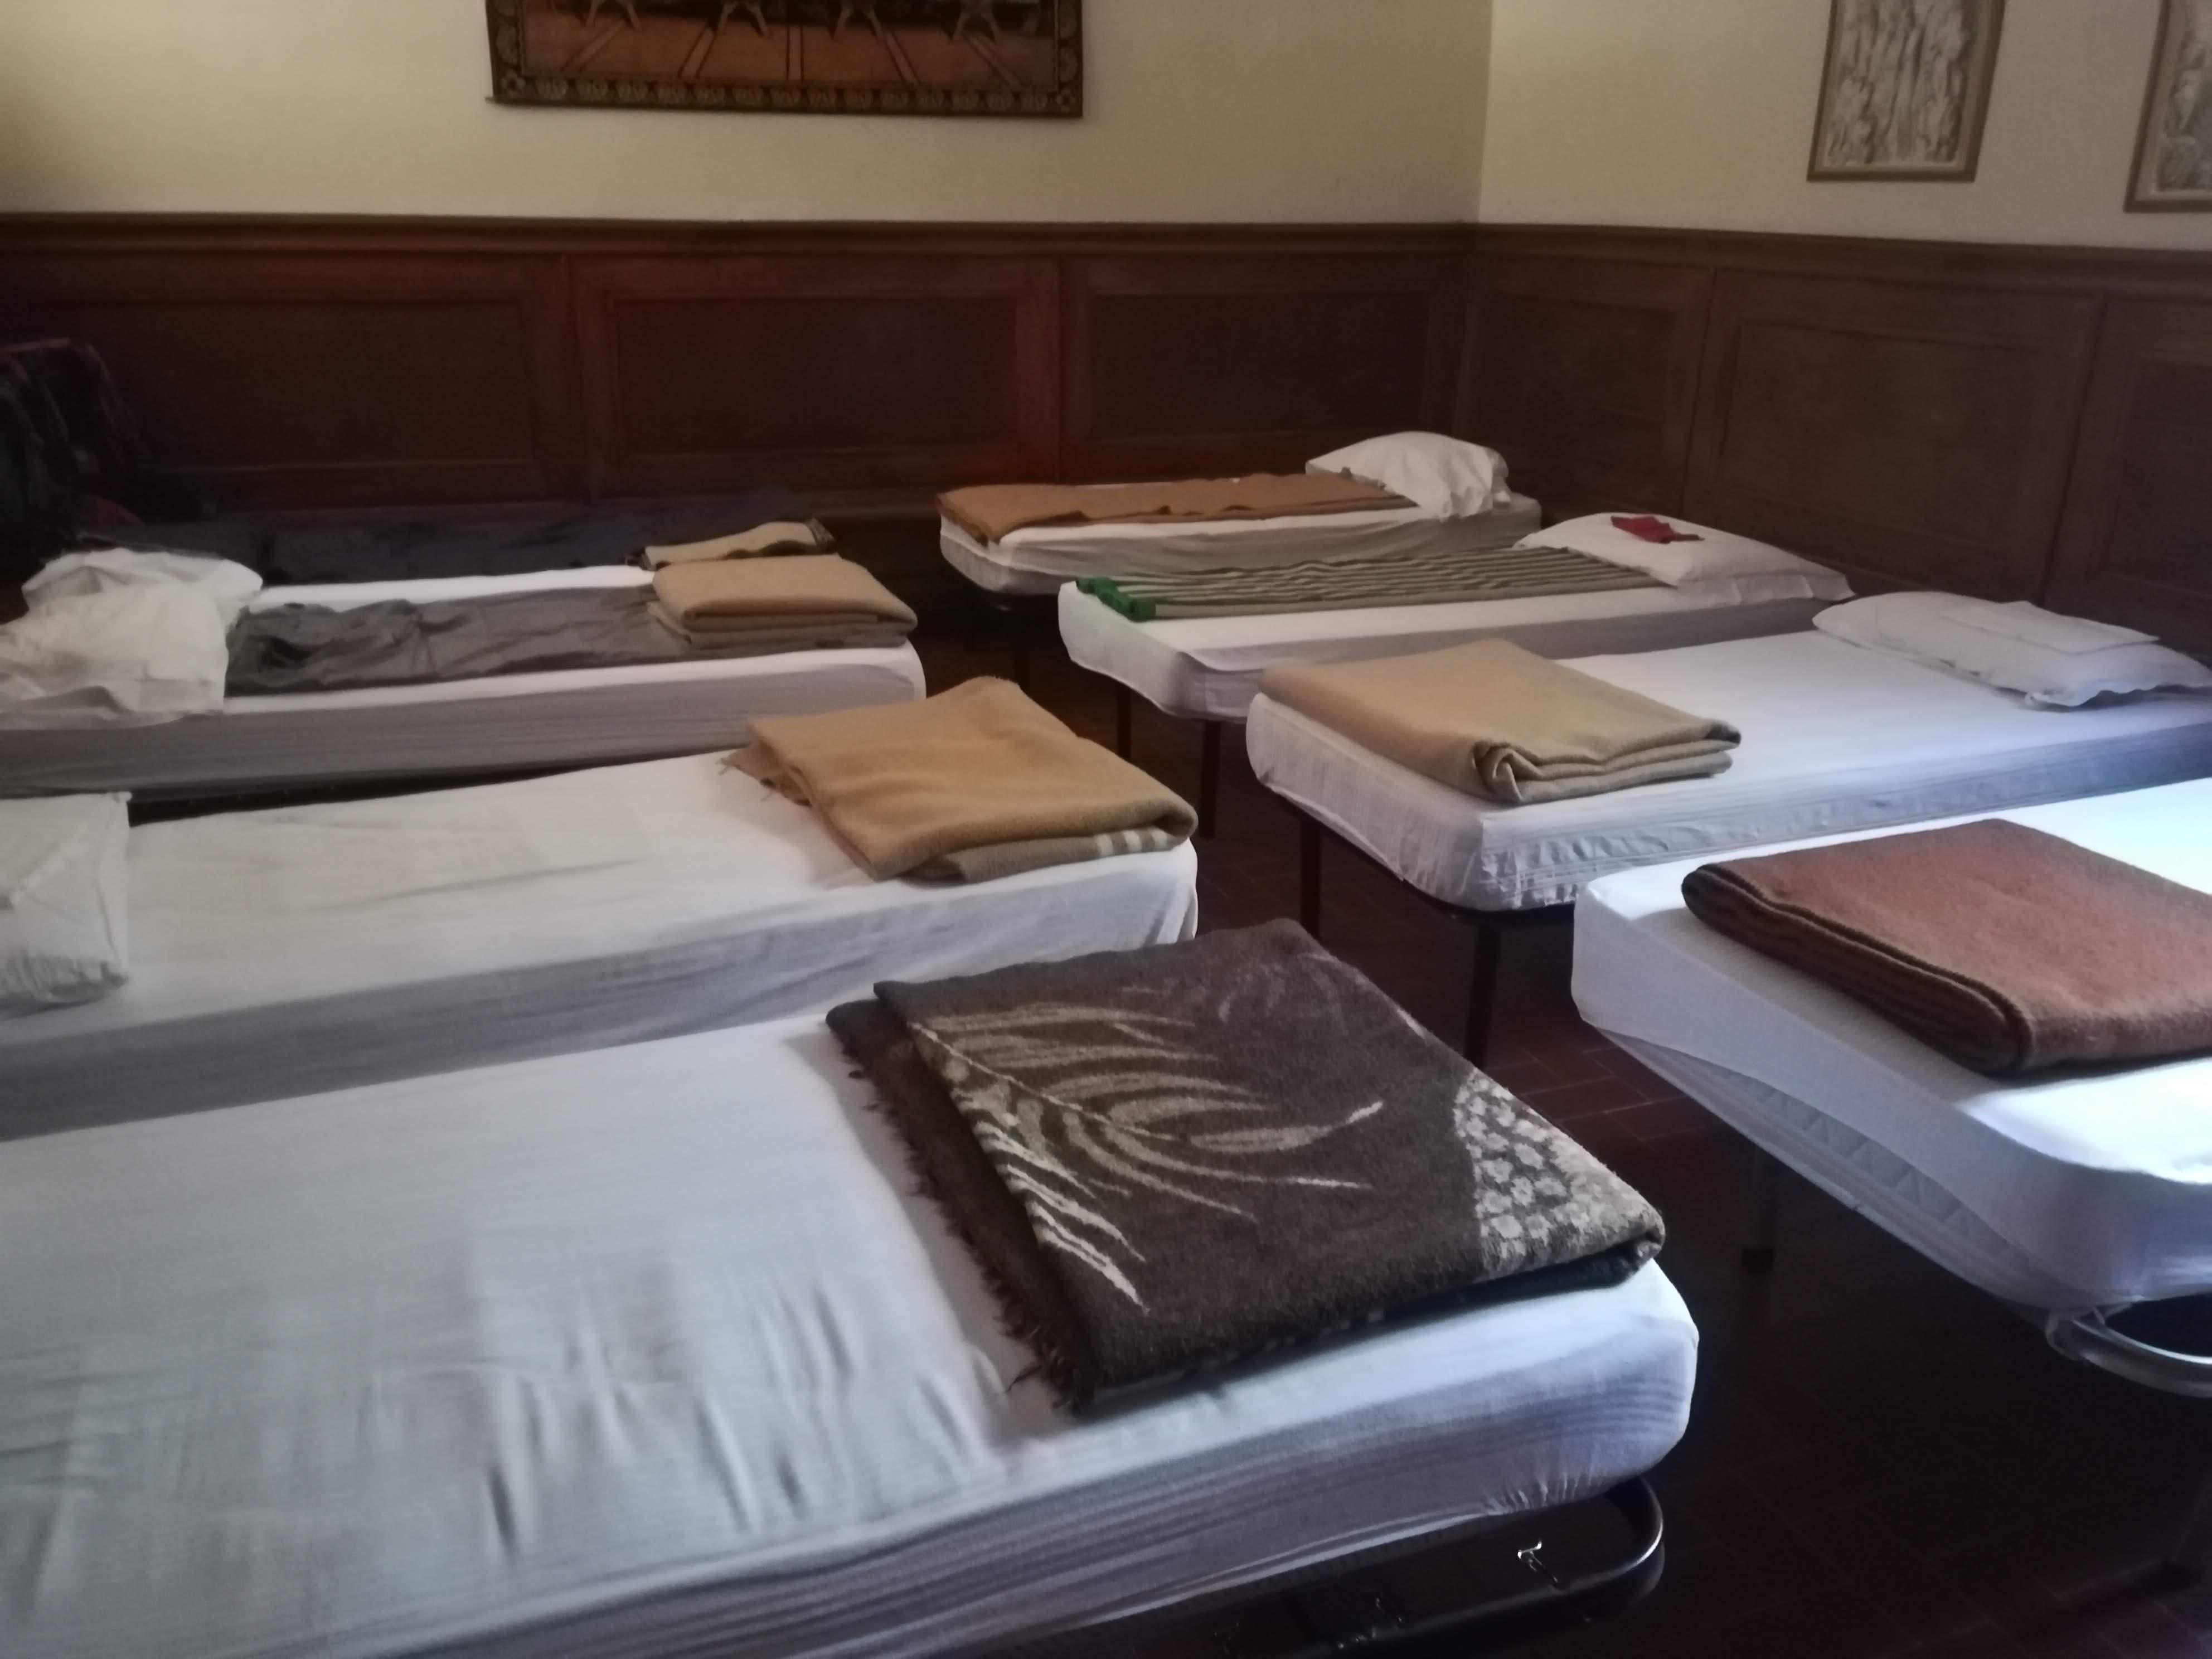 Dormitorio di La Verna, Via di Francesco